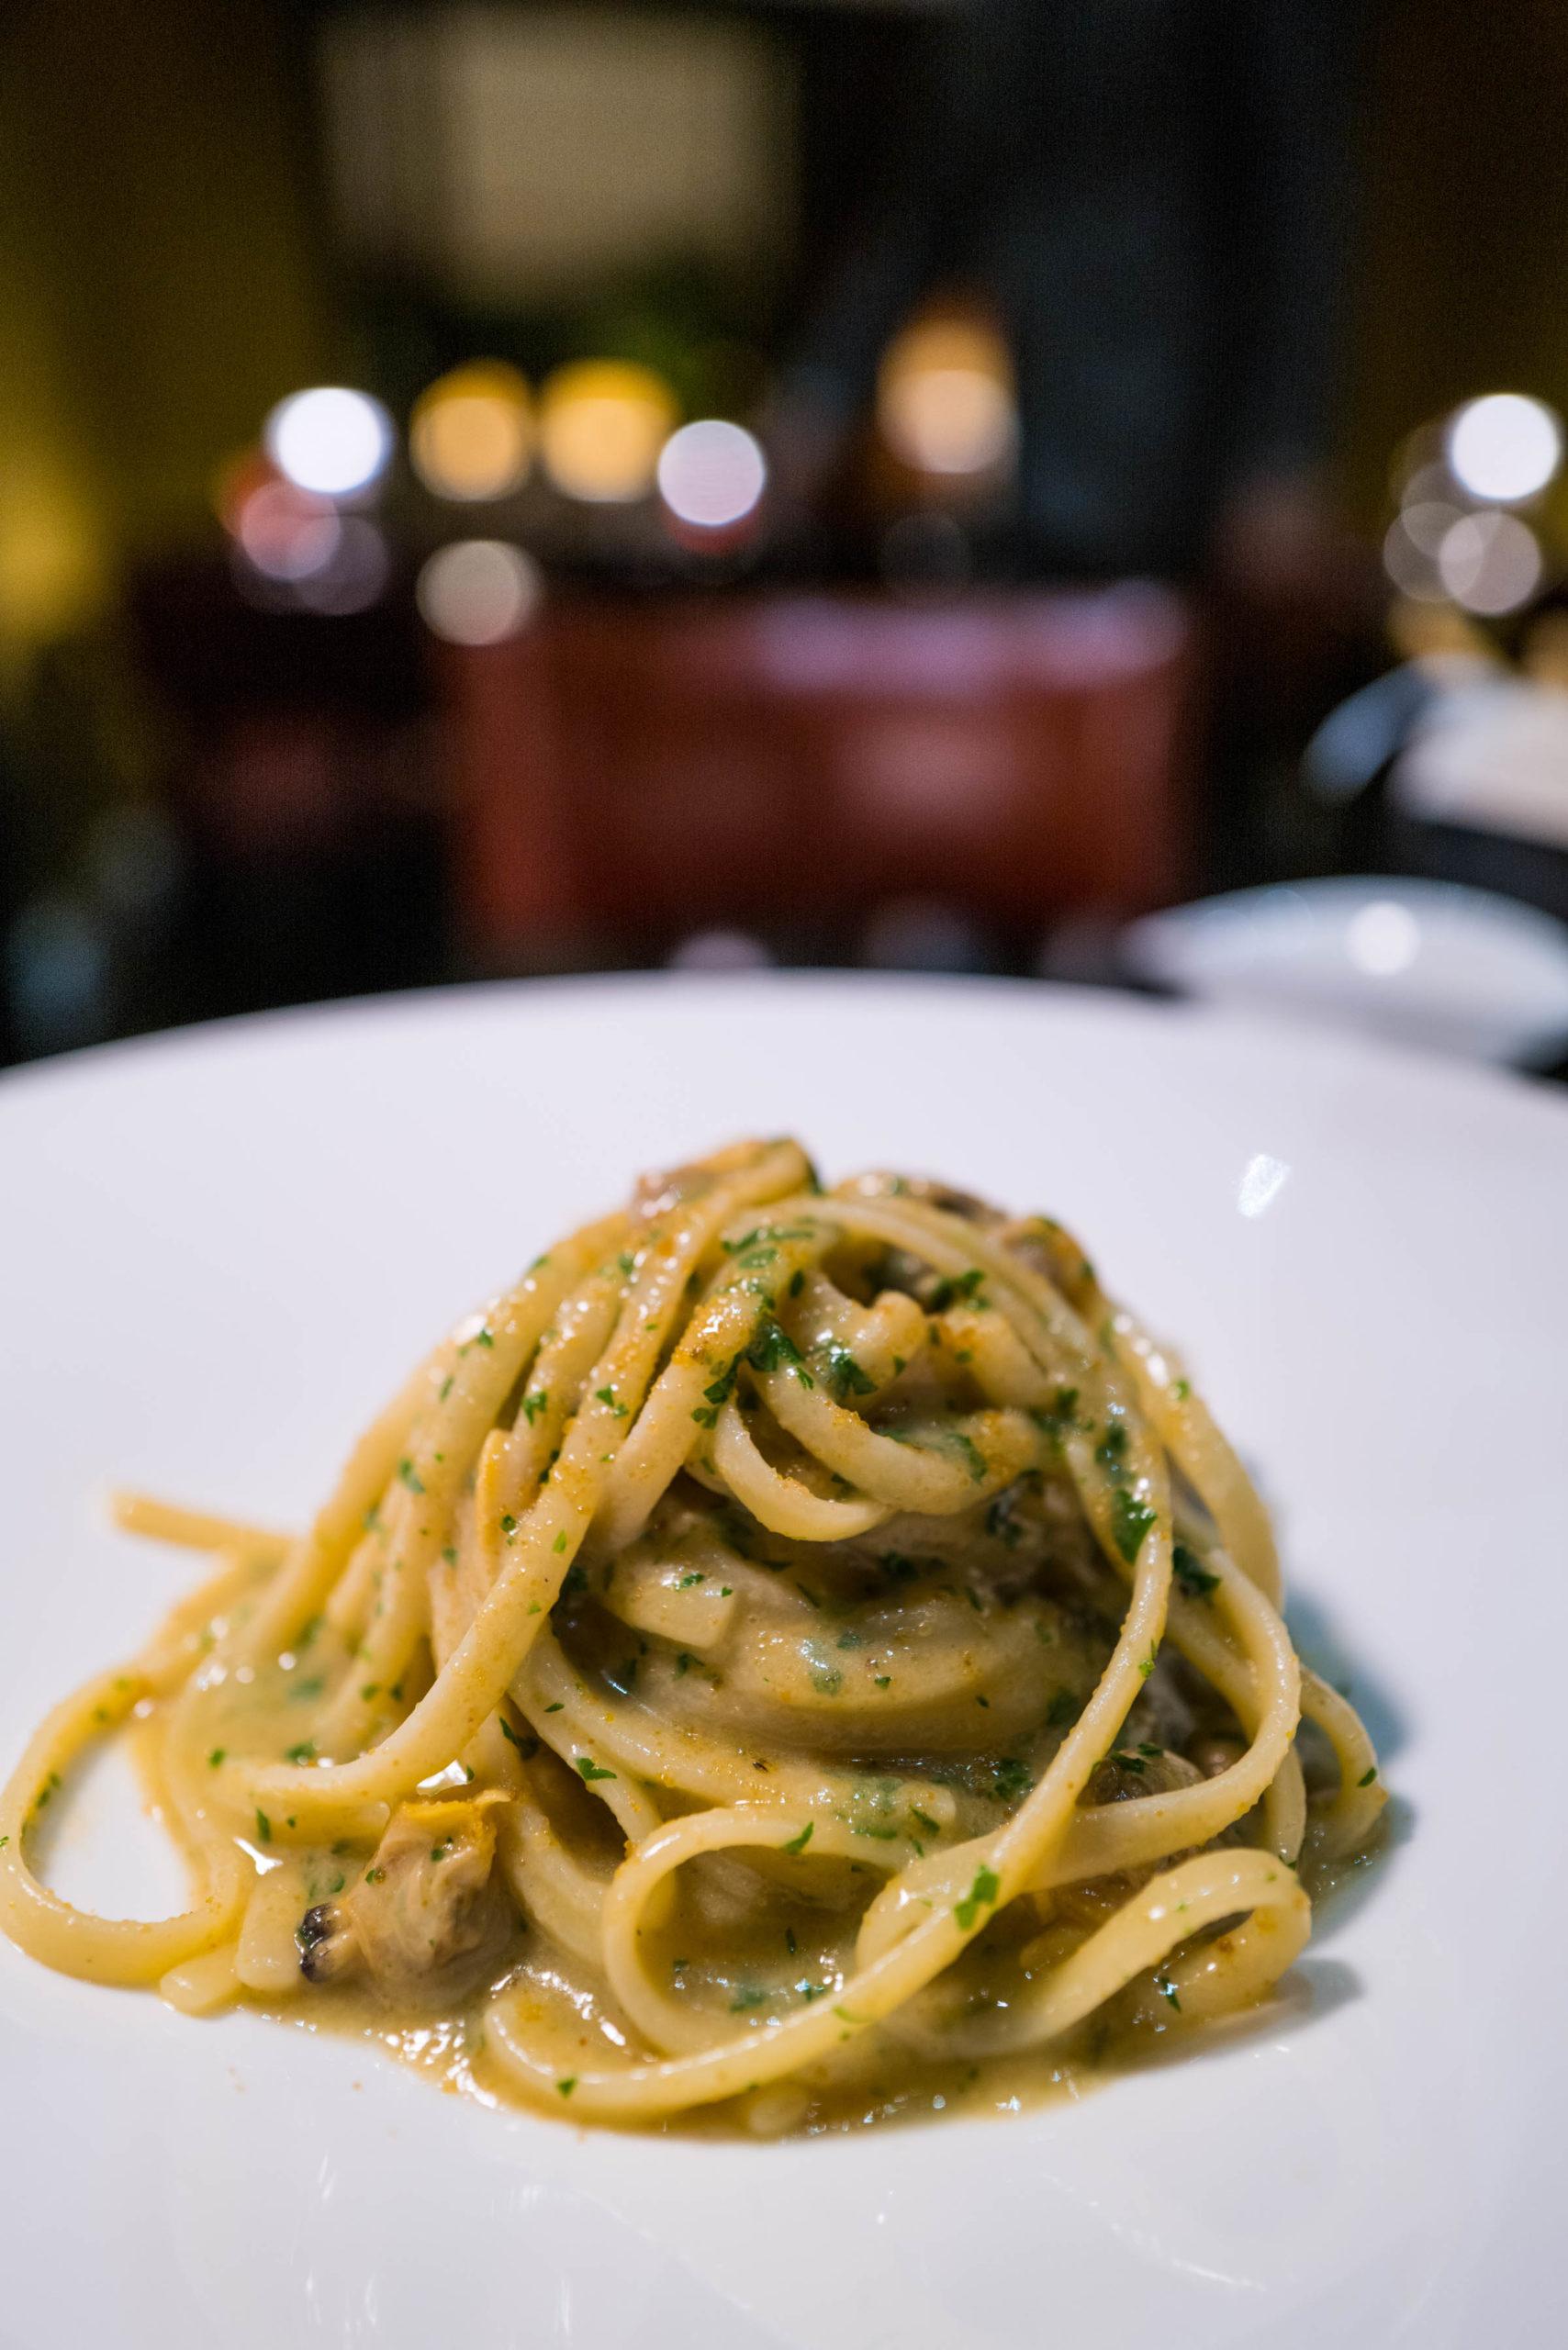 Pasta at JK Place Roma, The Taste Edit #hotel #rome #travel #pasta #italy